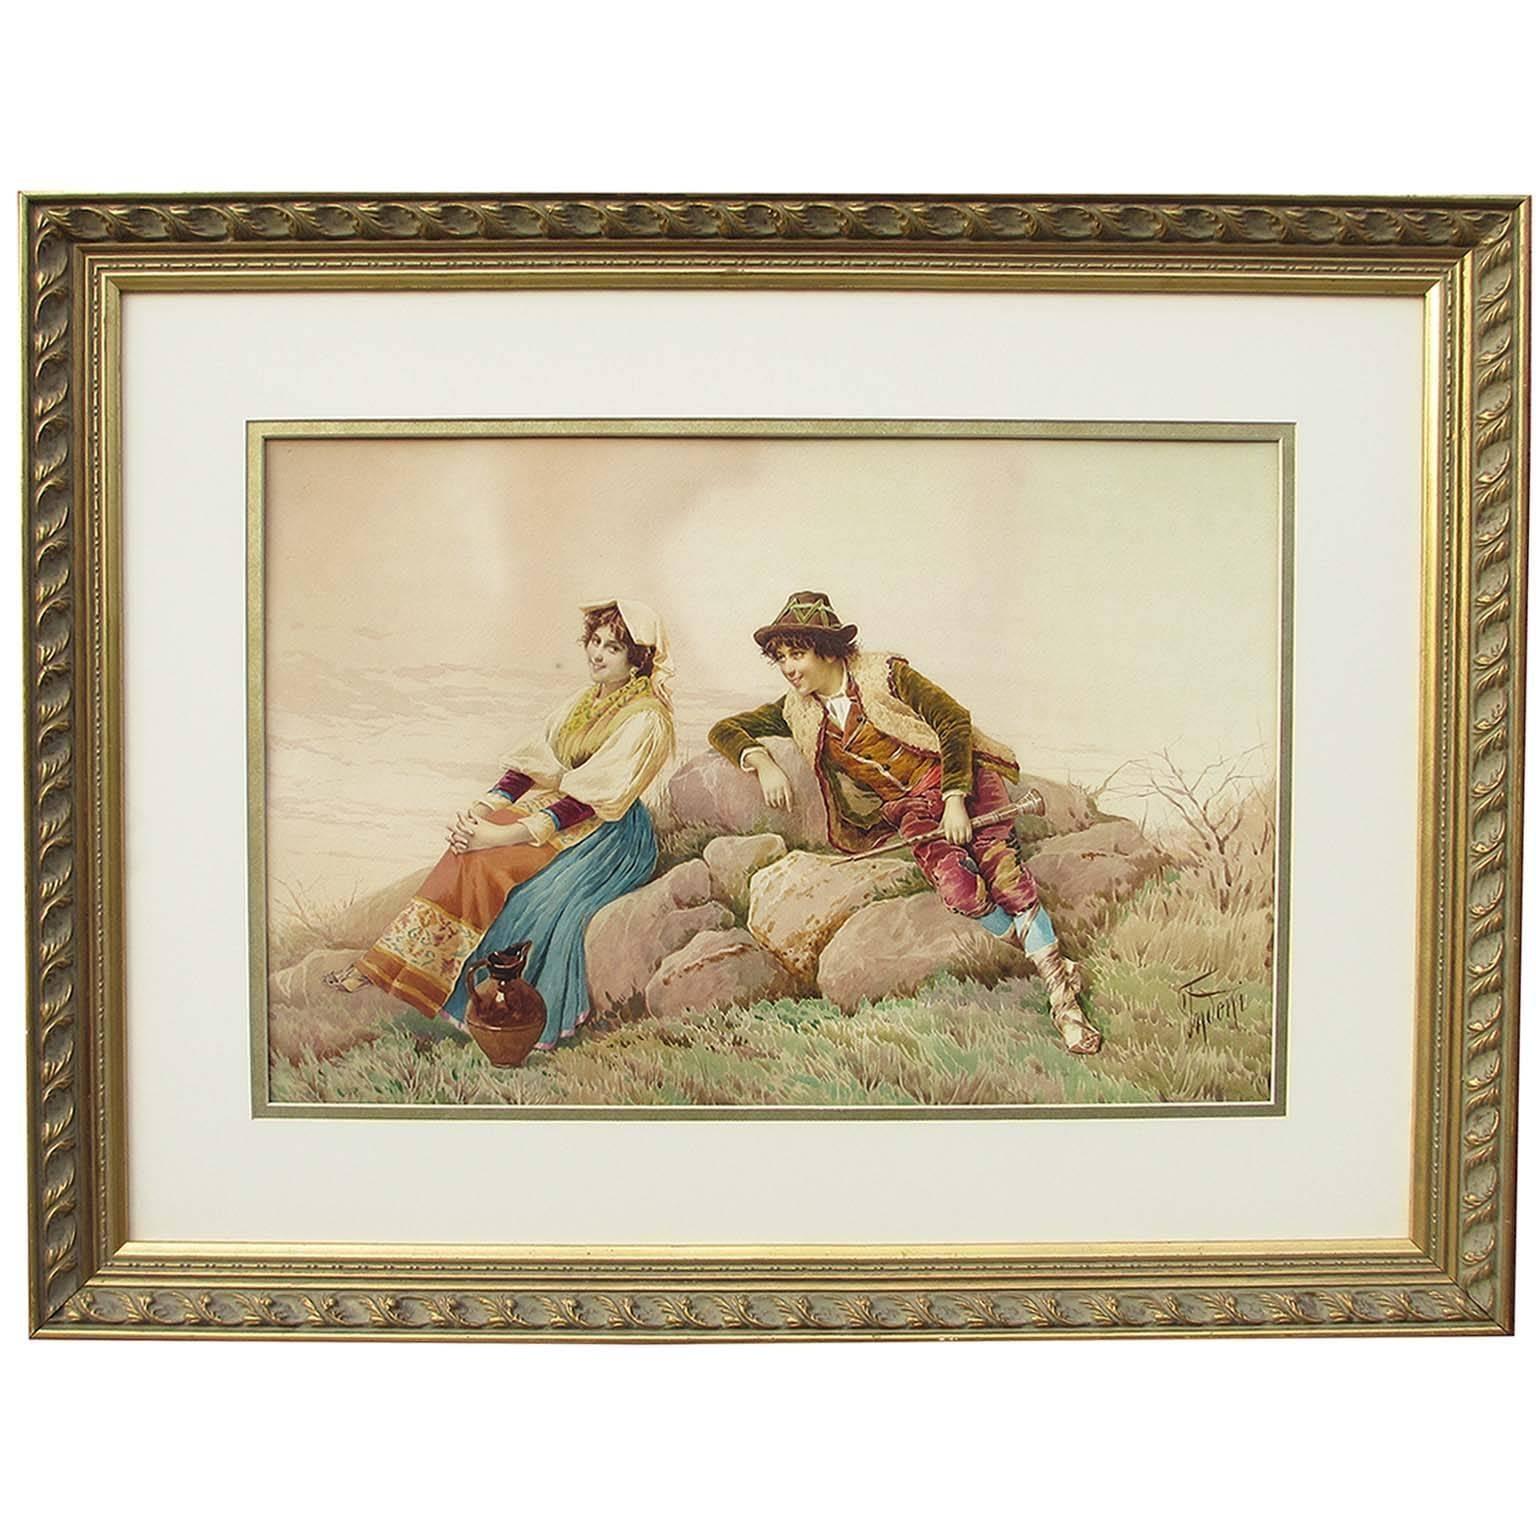 "Filippo Indoni (Italian, 1842-1908) ""The Lover's Courtship"" Watercolor on Paper"